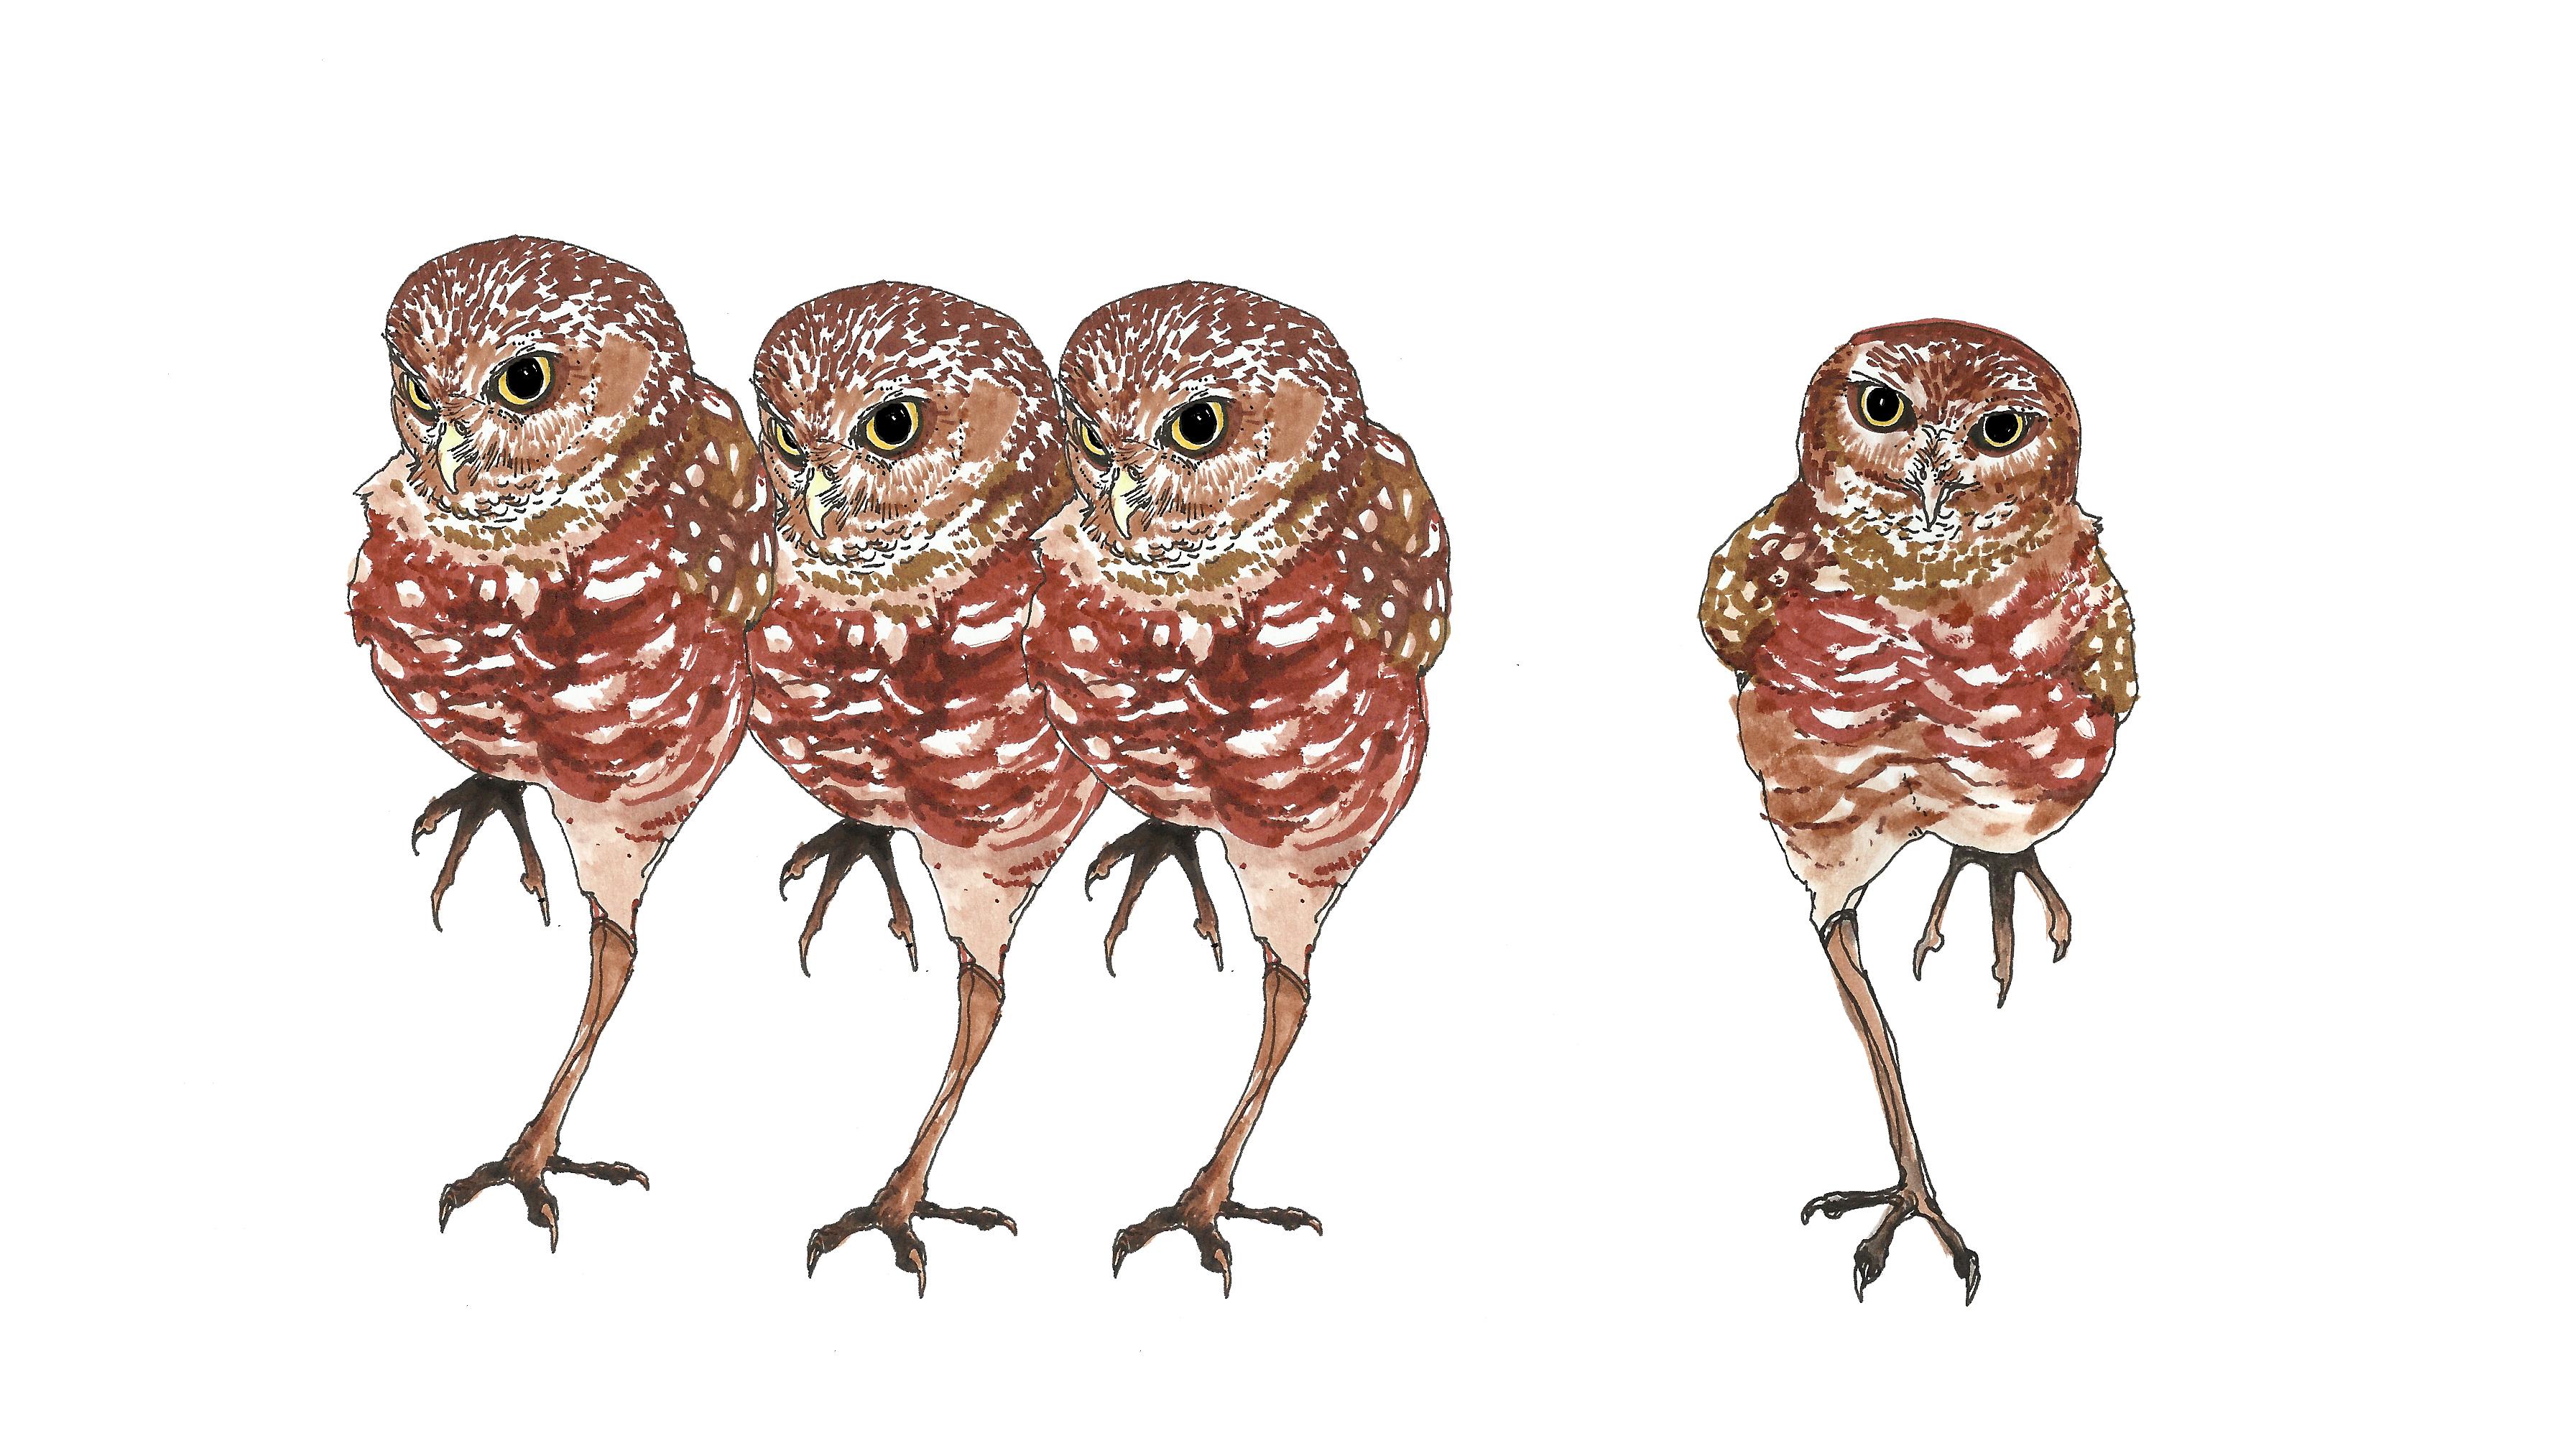 Wallpaper Ilustrasi Burung Buas Burung Hantu Paruh Fauna